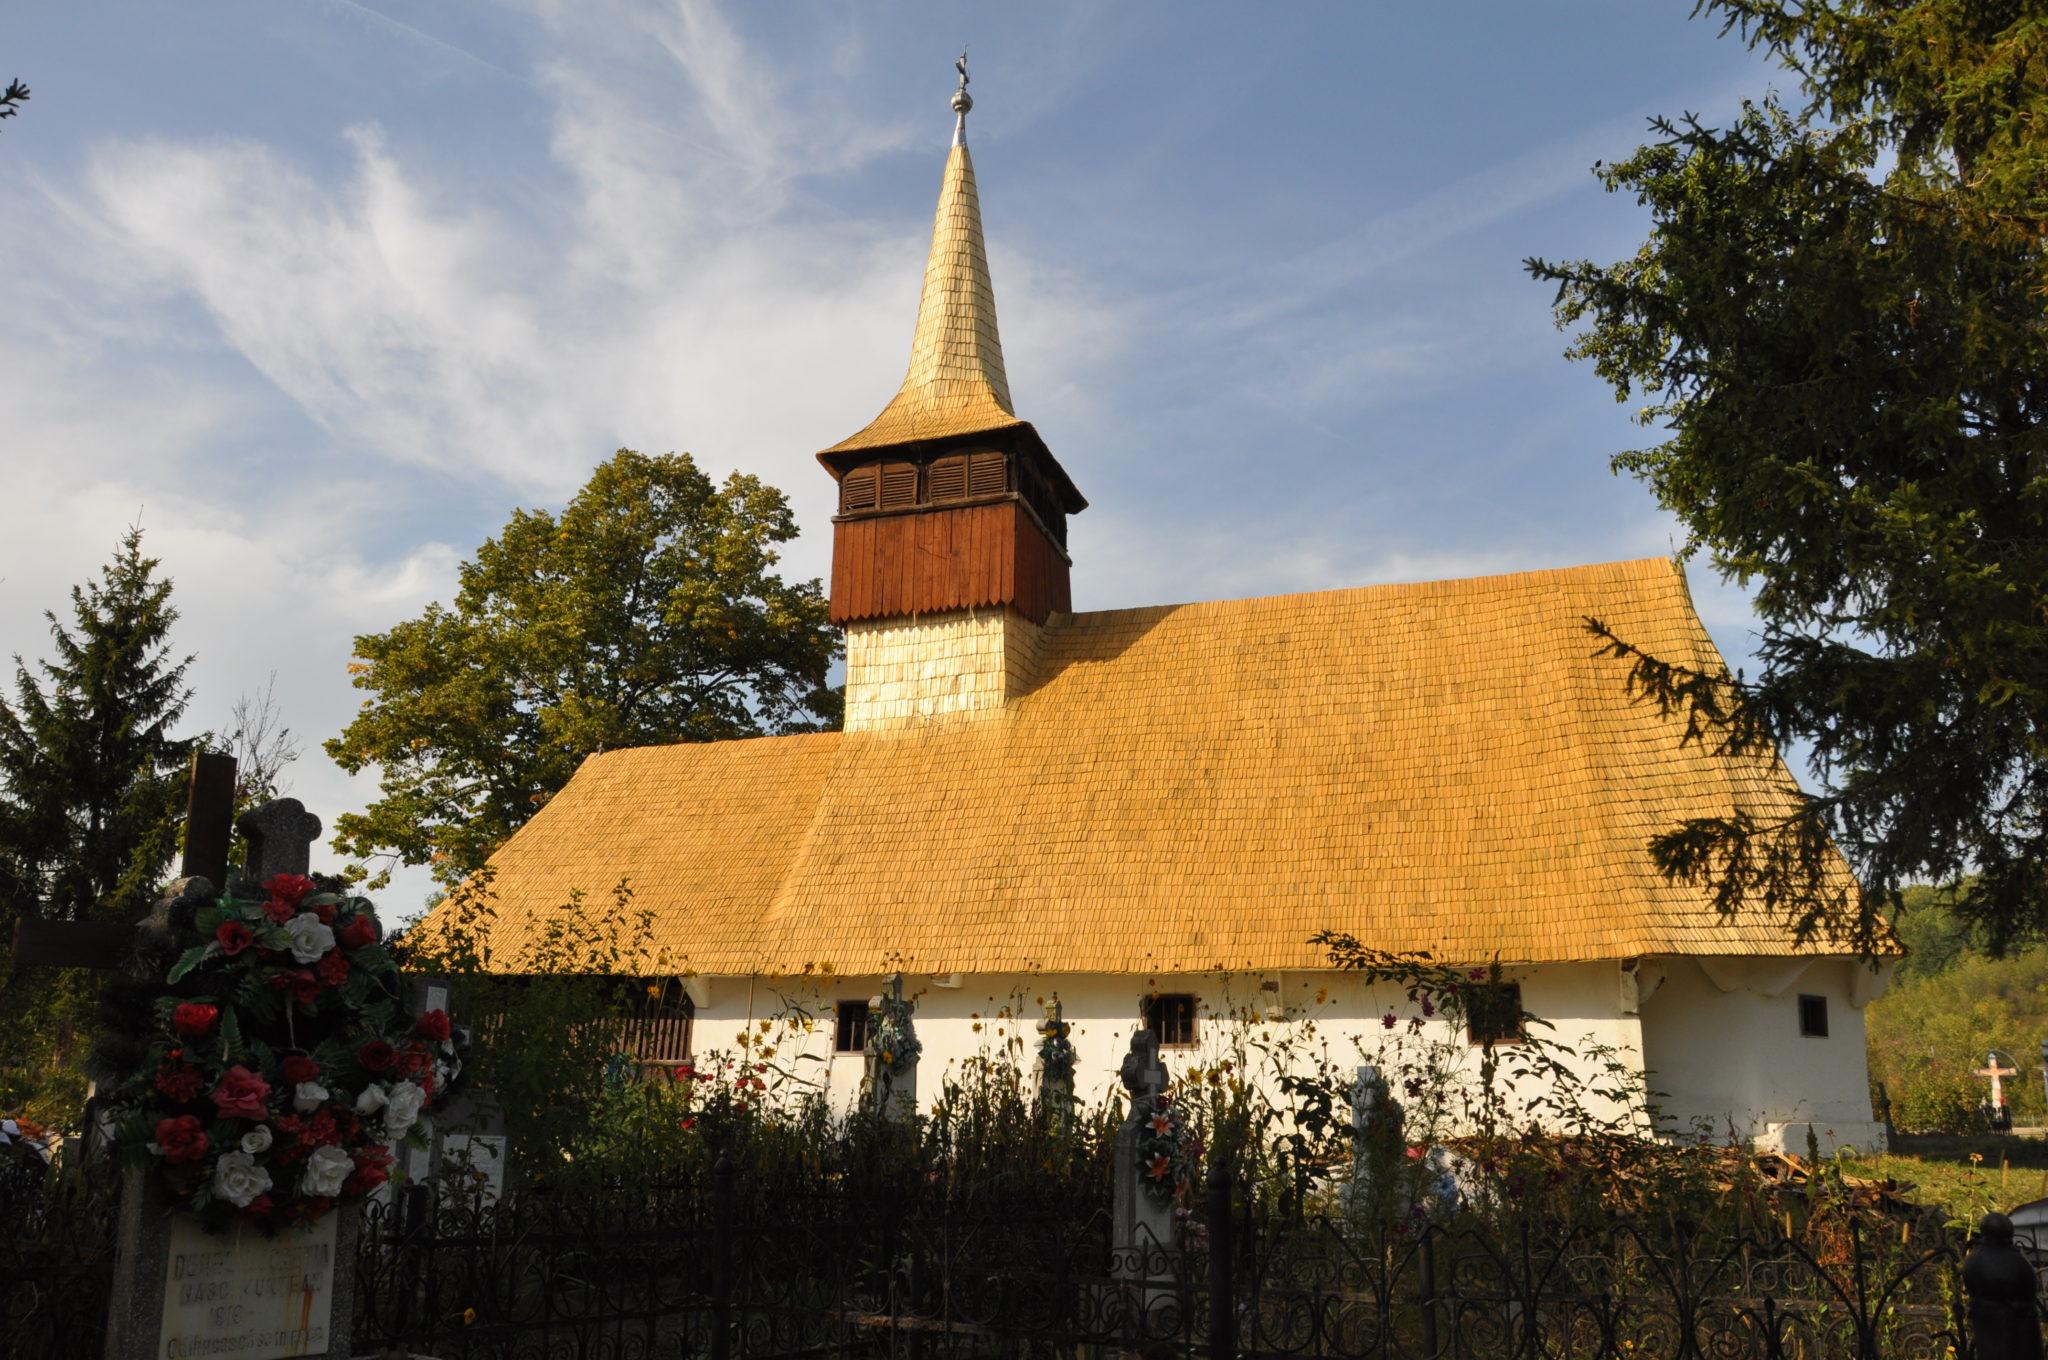 Church in Boz, Hunedoara County (1791)